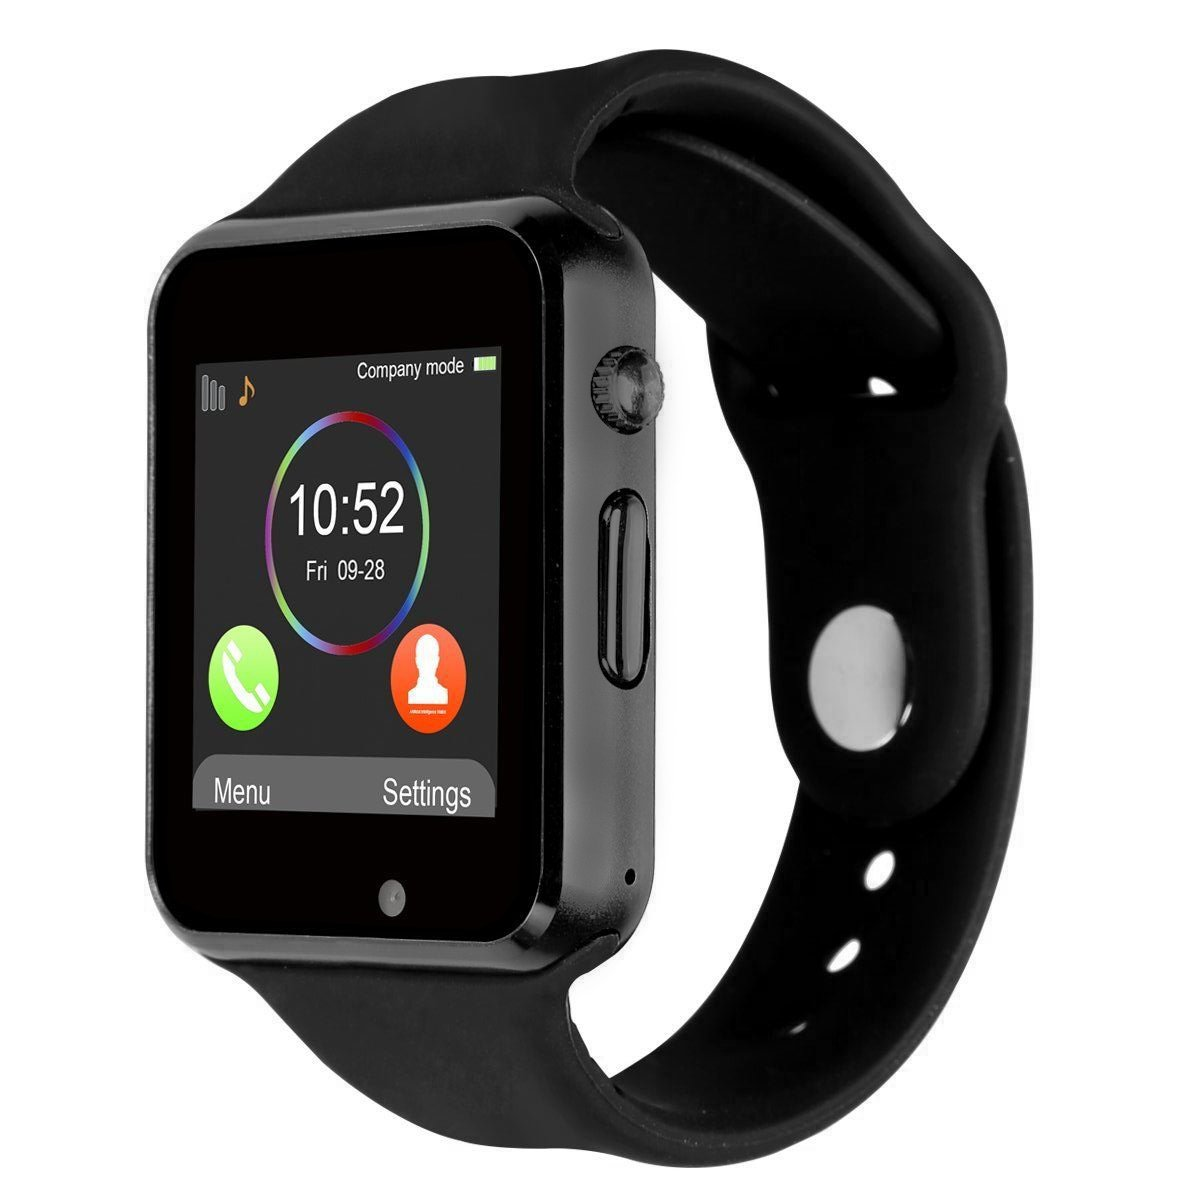 Smartwatch Bluetooth Correa suave CHEREEKI Reloj de pulsera deportivo con pantalla táctil